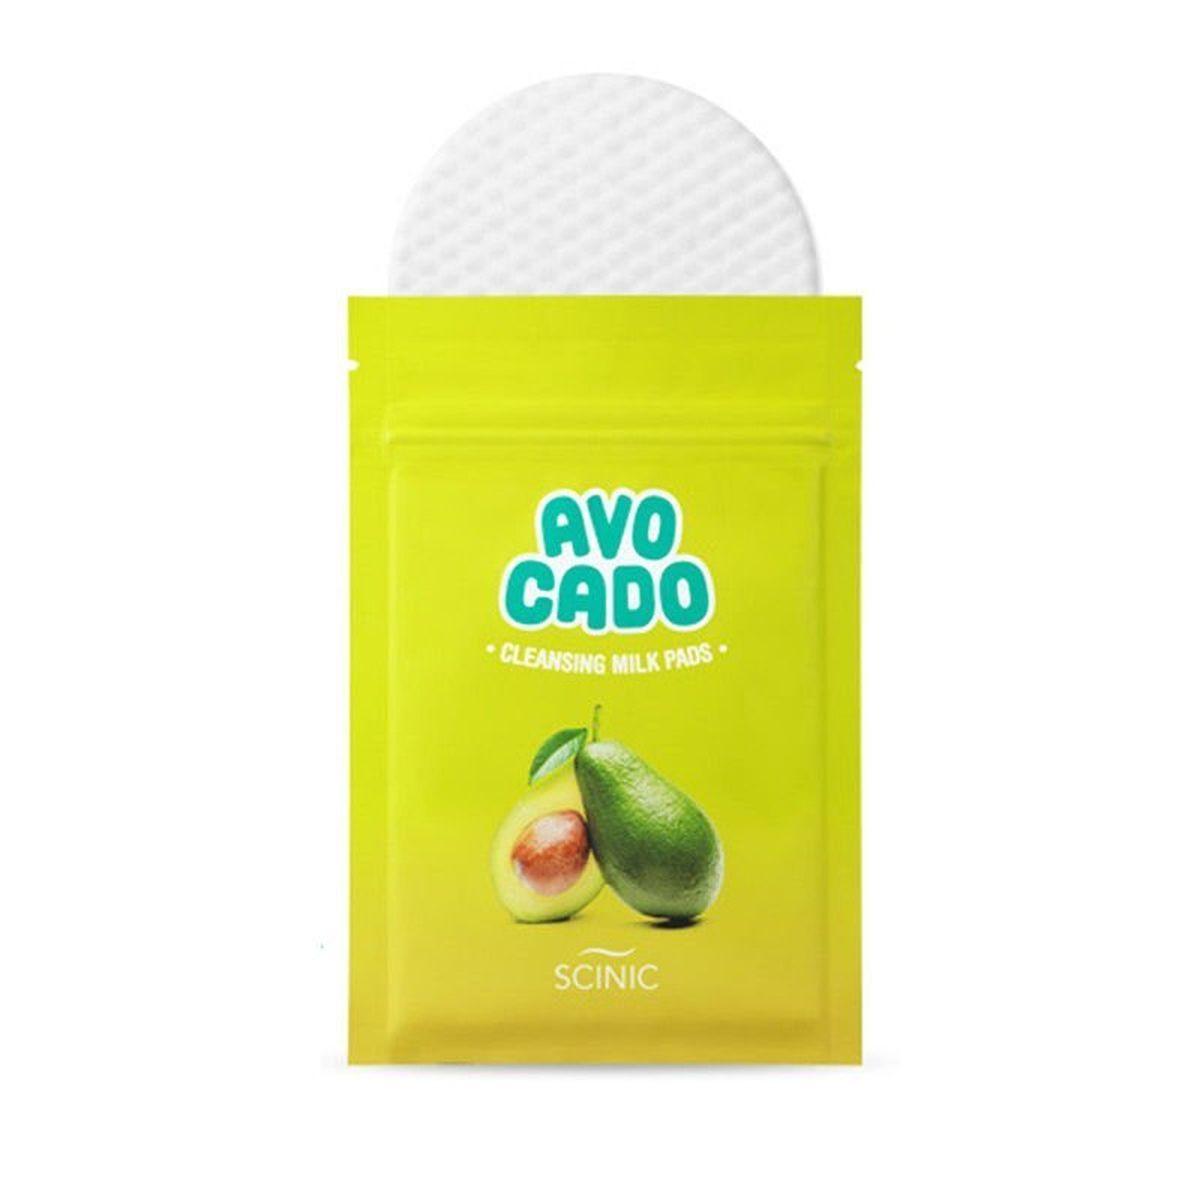 Спонж для снятия макияжа Scinic Avocado Lip And Eye Remover Pads - 1 шт